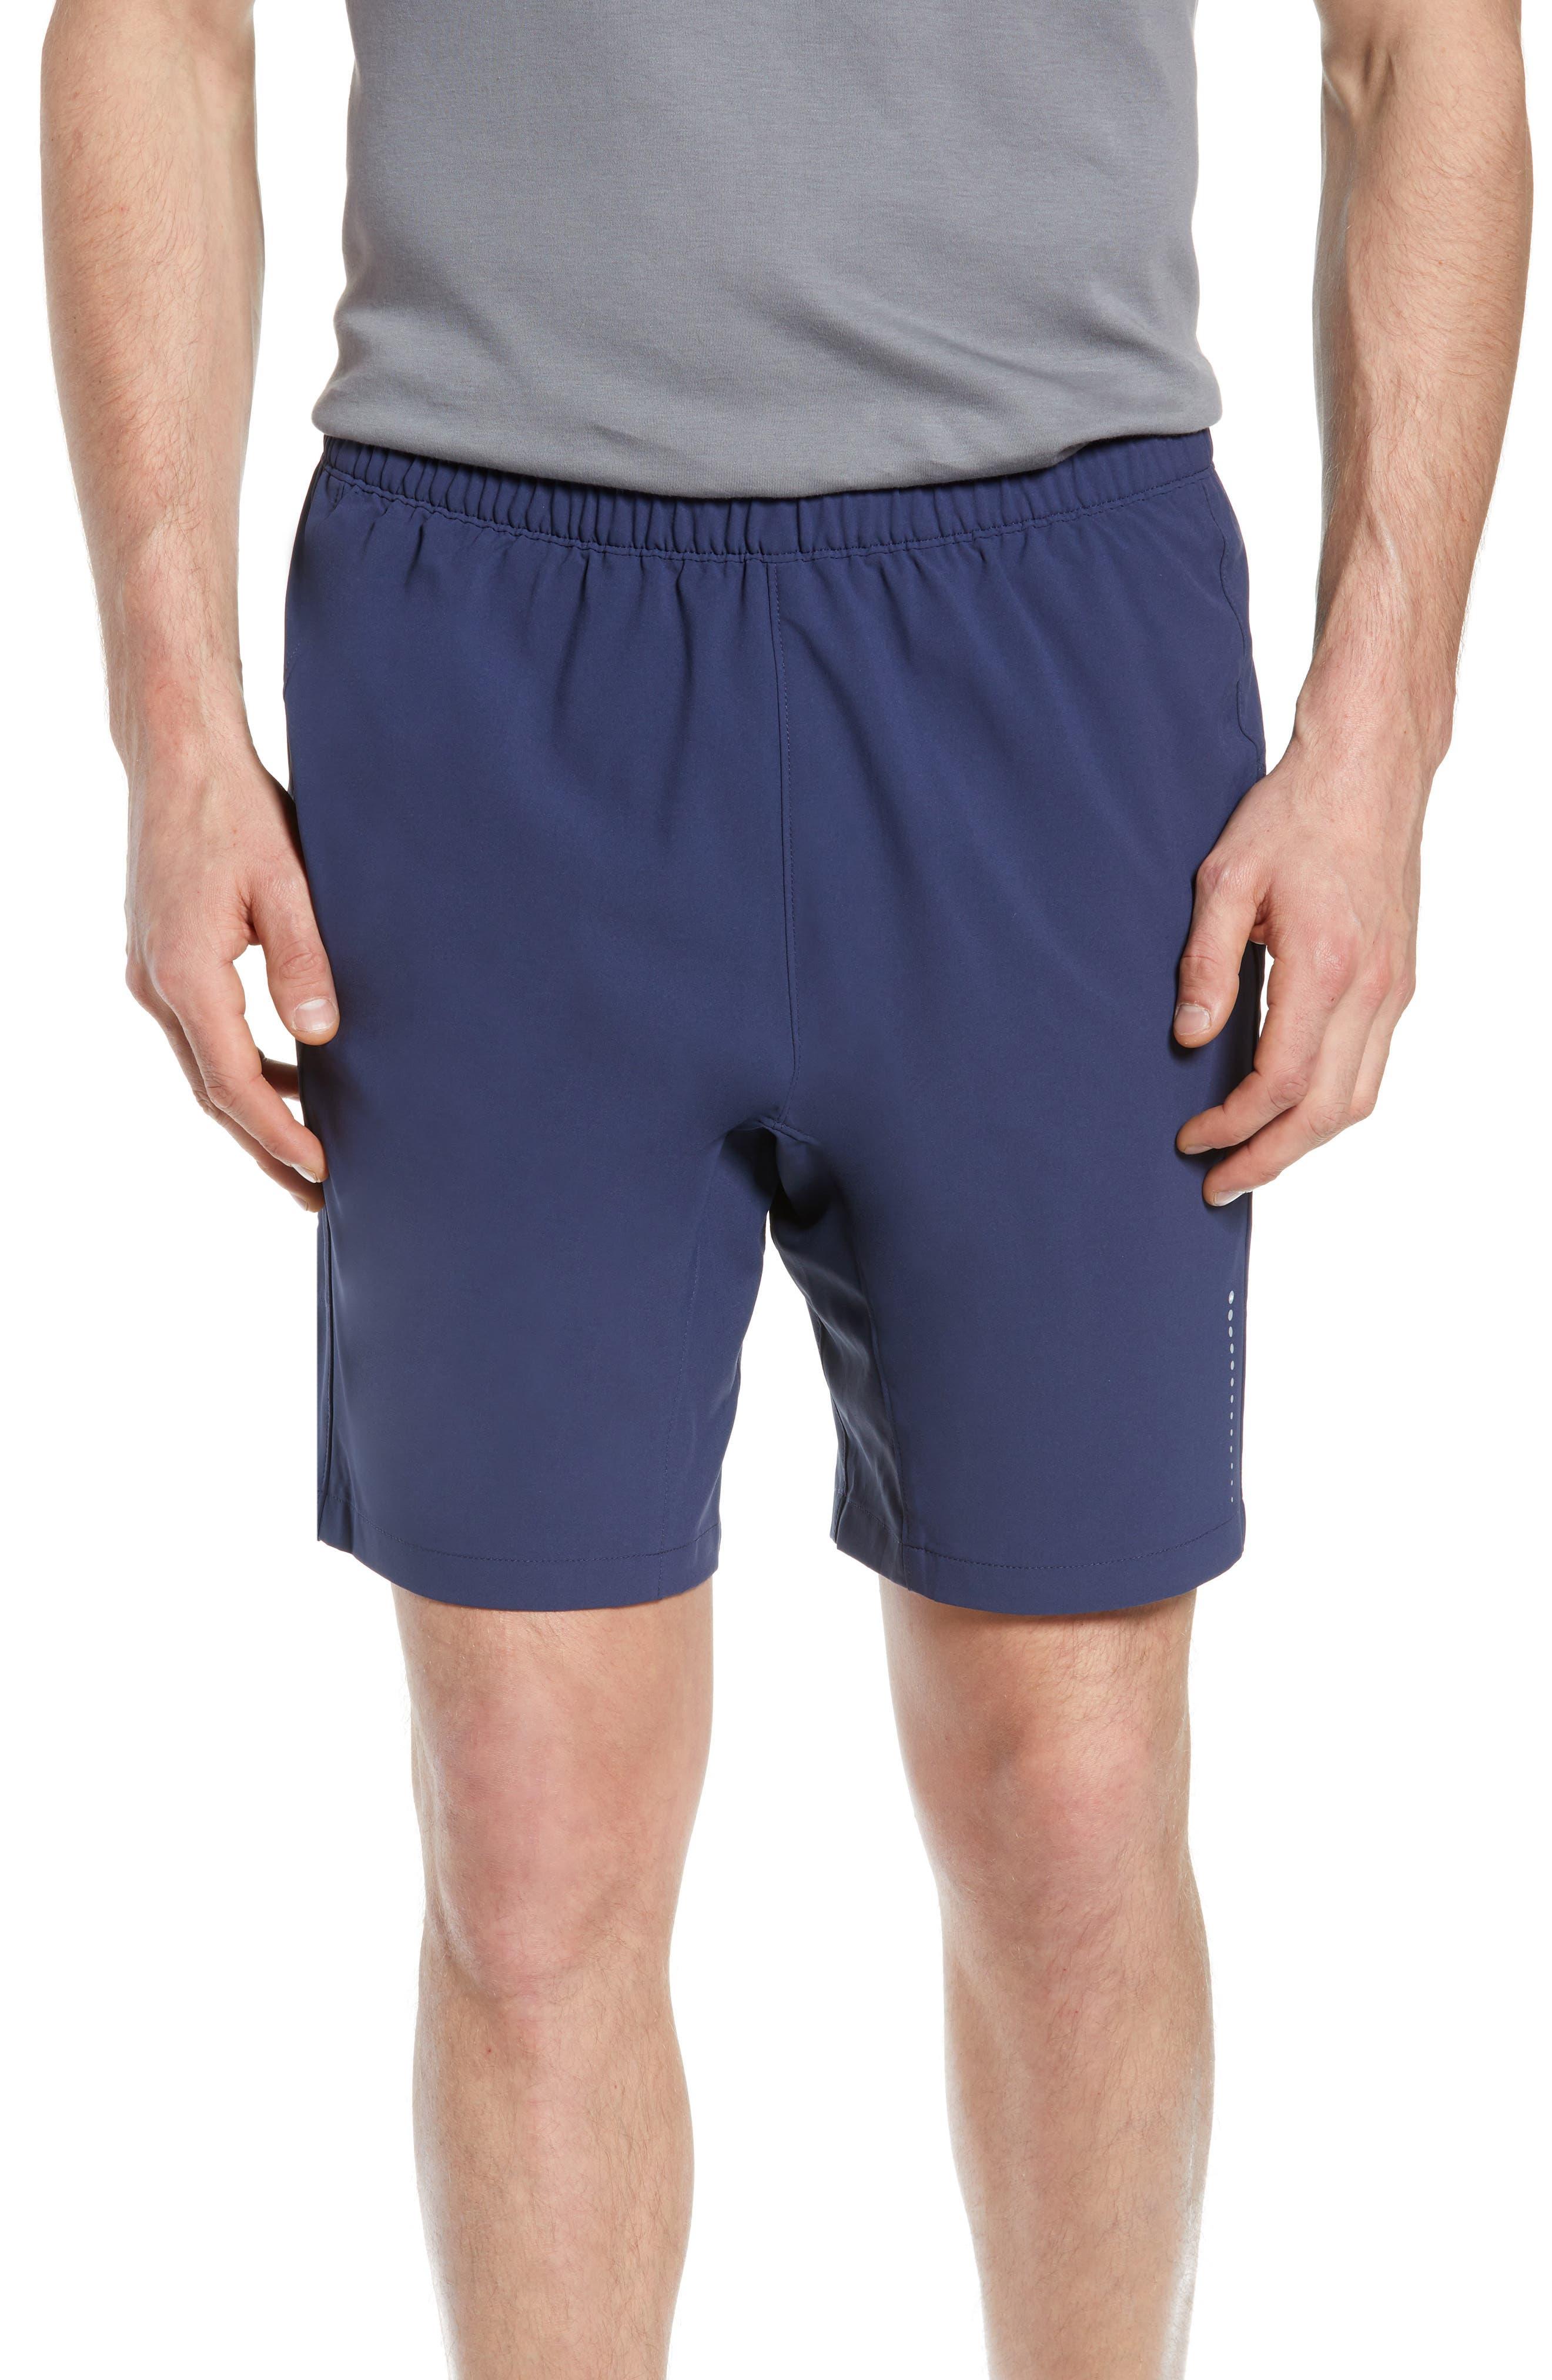 Peter Millar Montreal Action Training Shorts, Blue